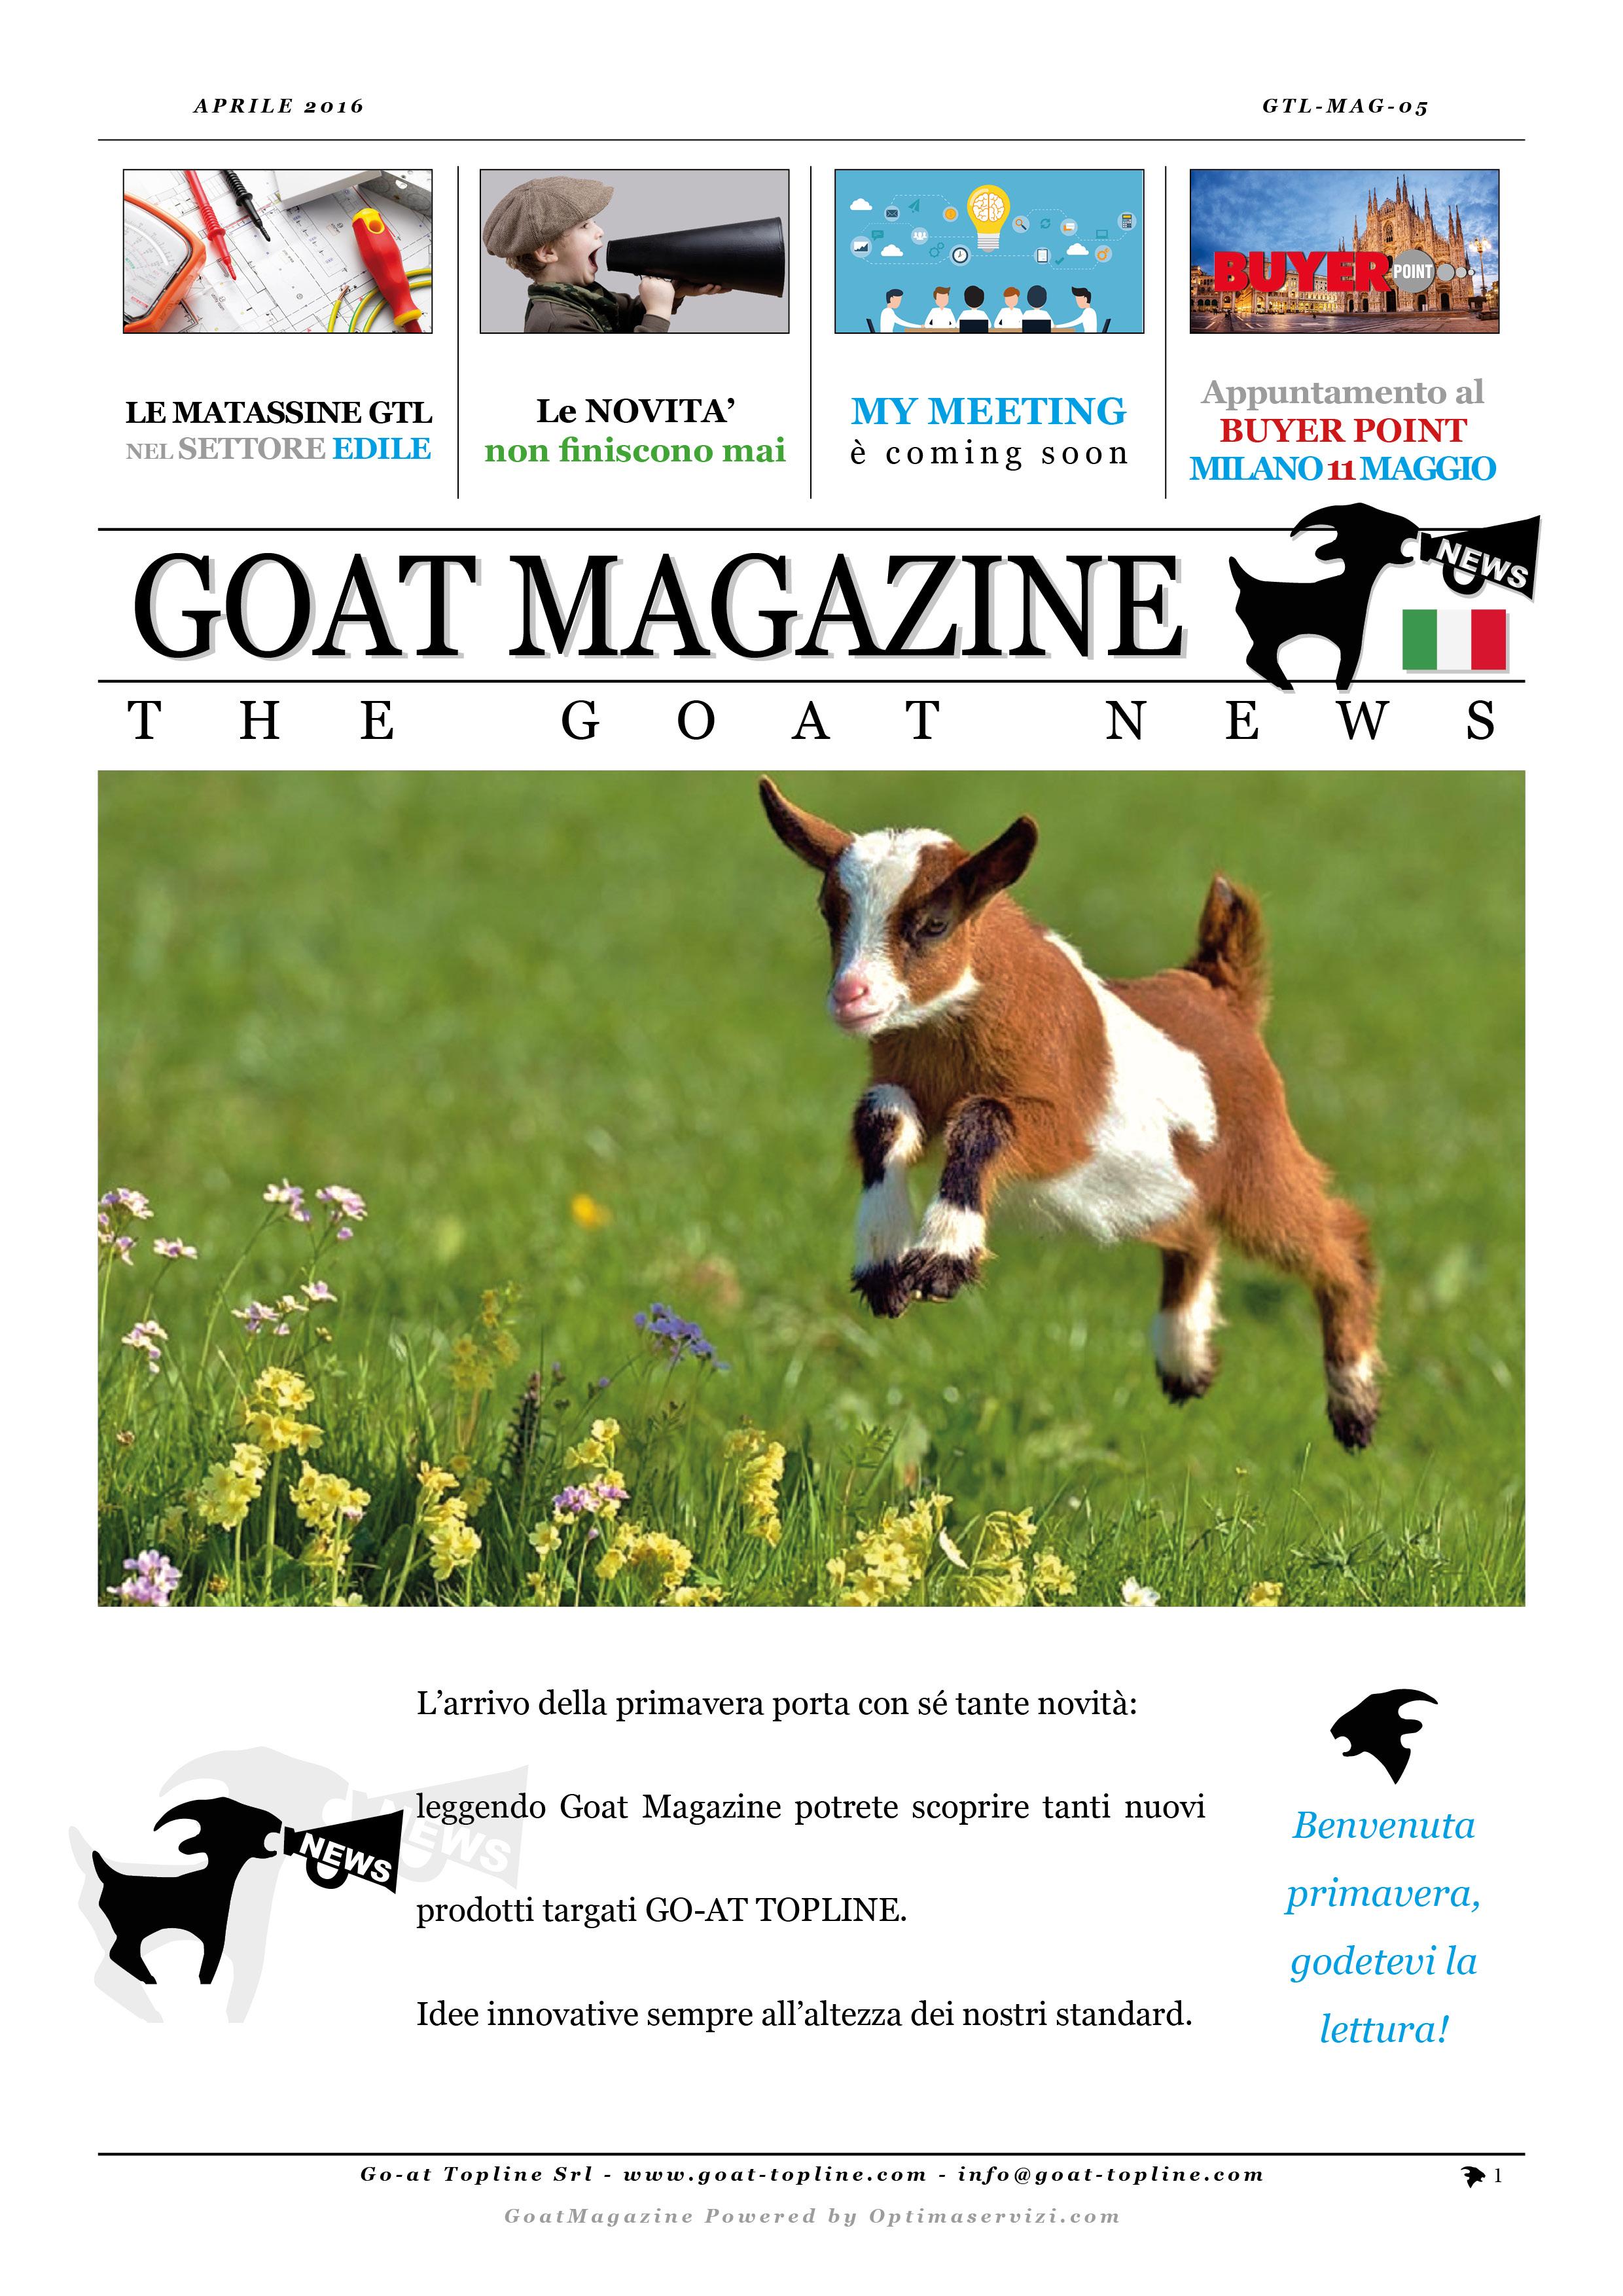 GTL-MAG05 -PUBBLICO- Aprile 2016 - ITA